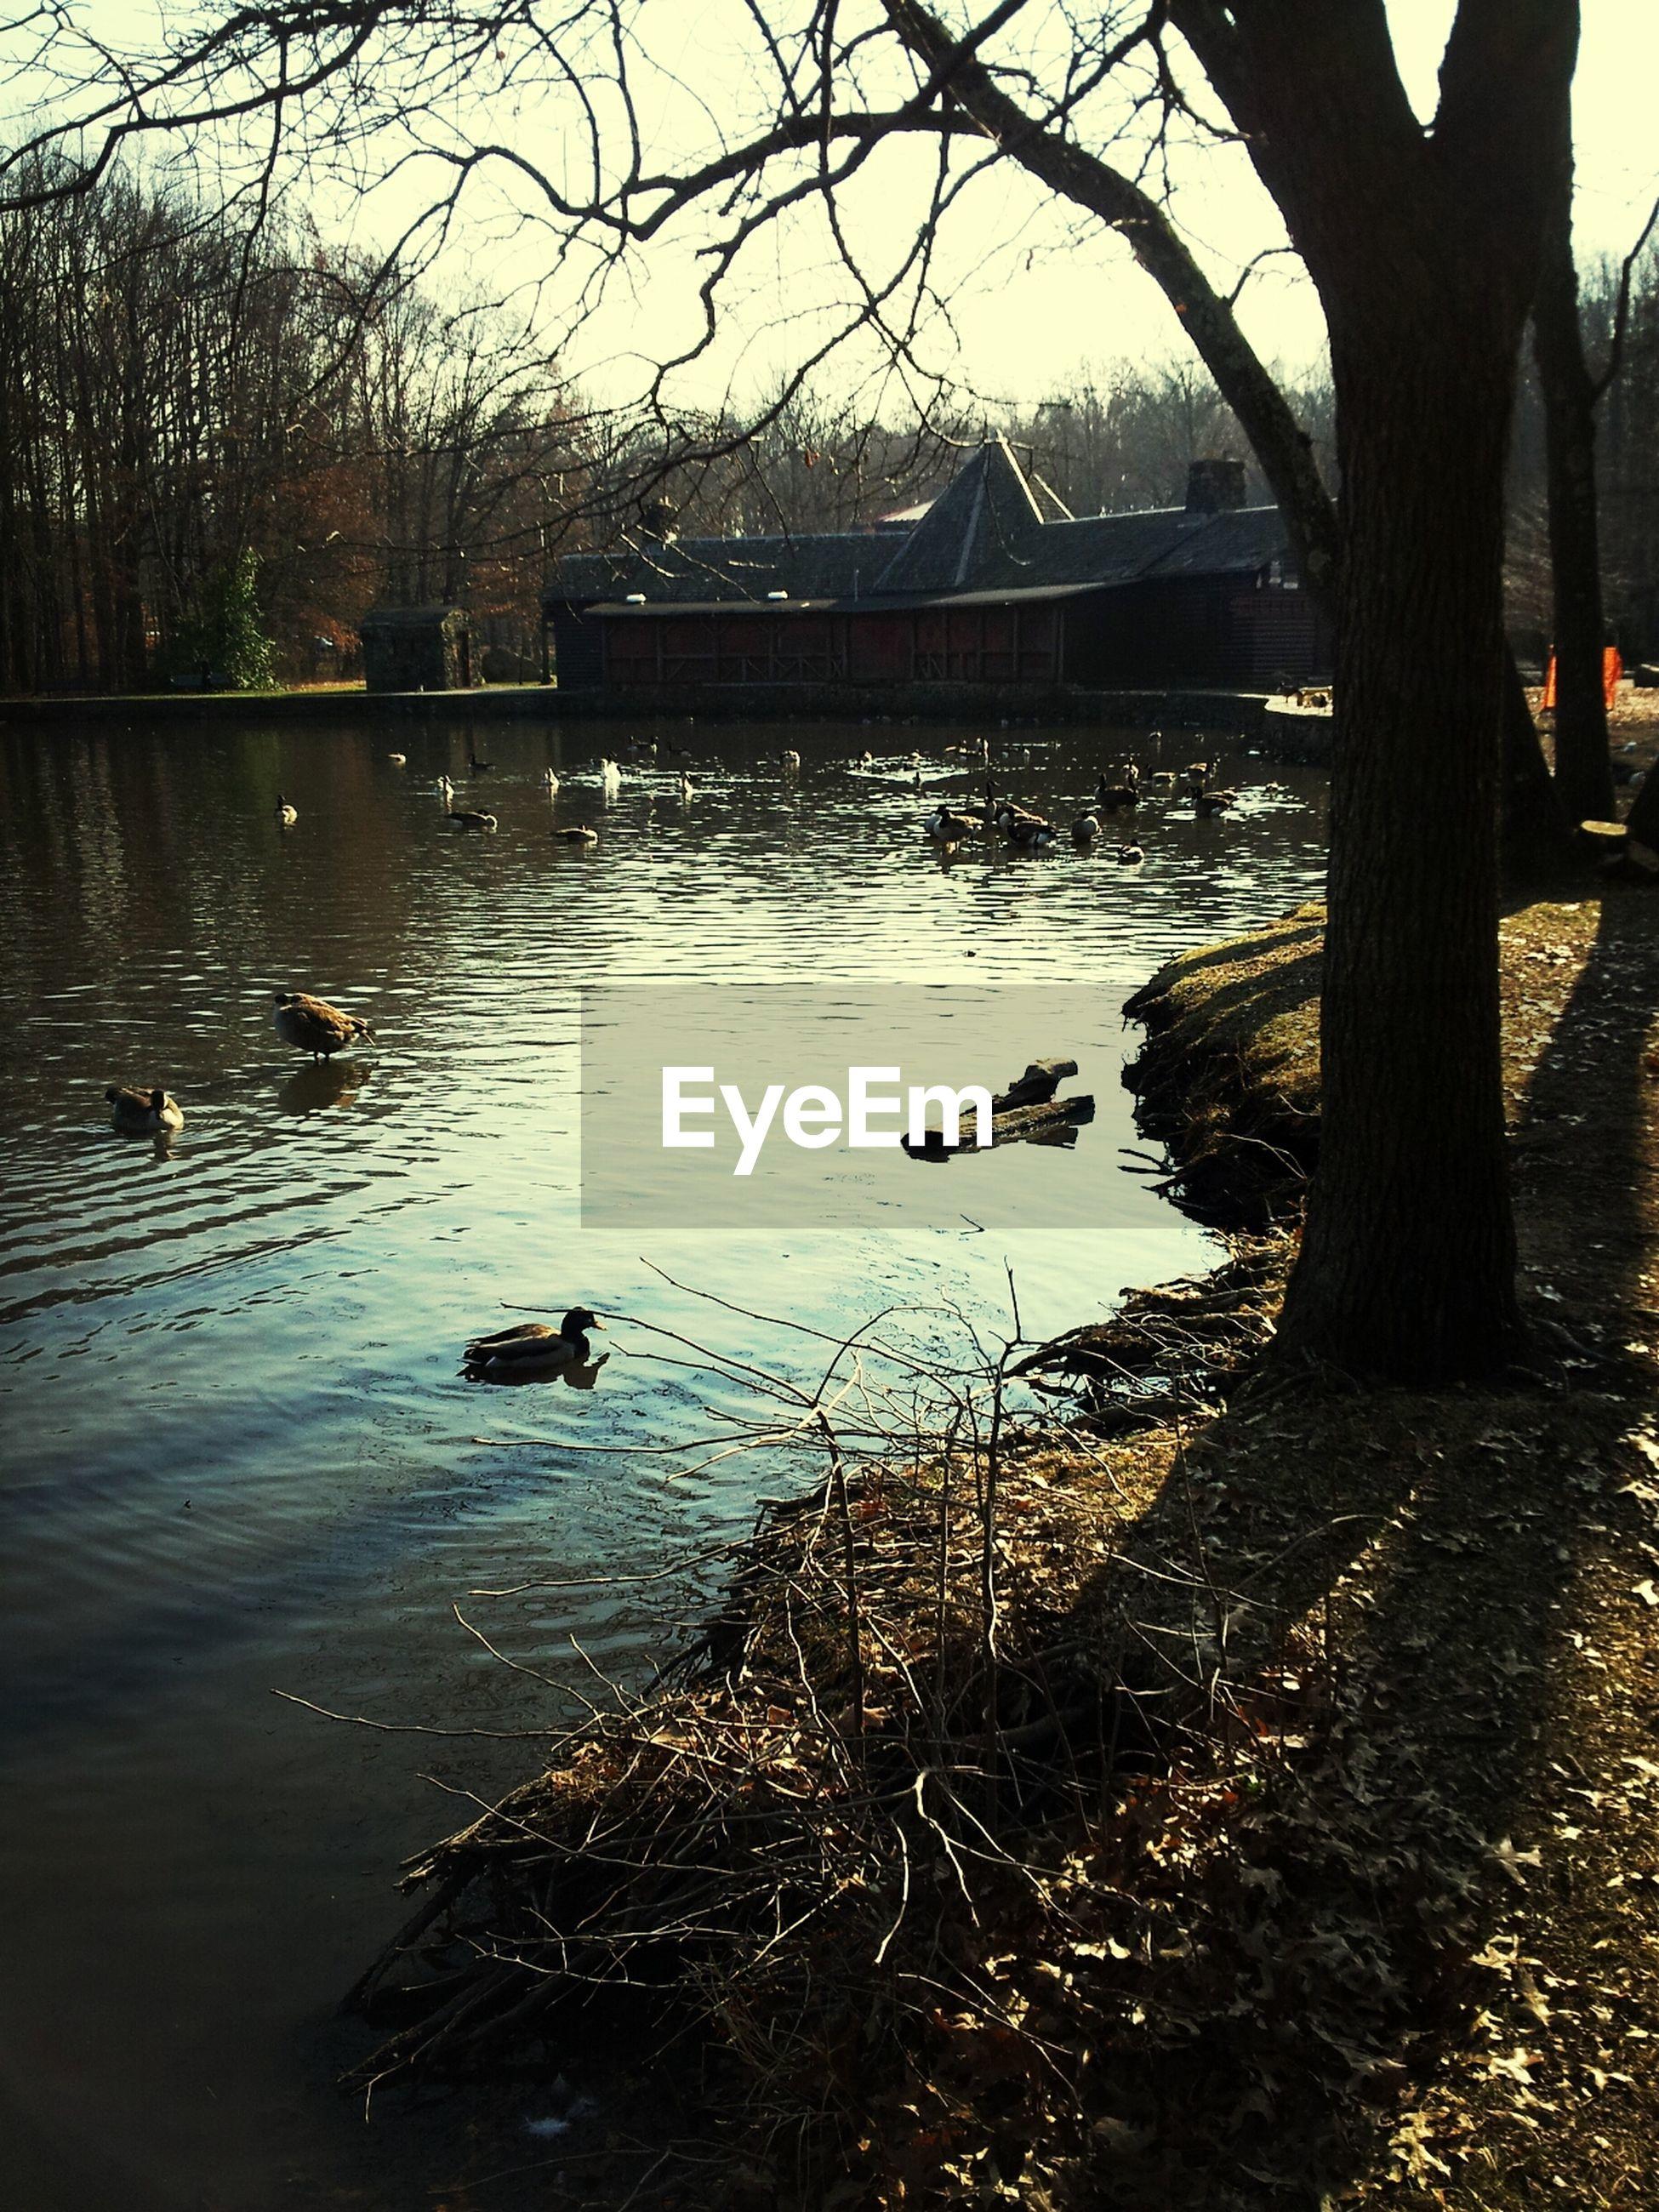 High angle view ducks in lake